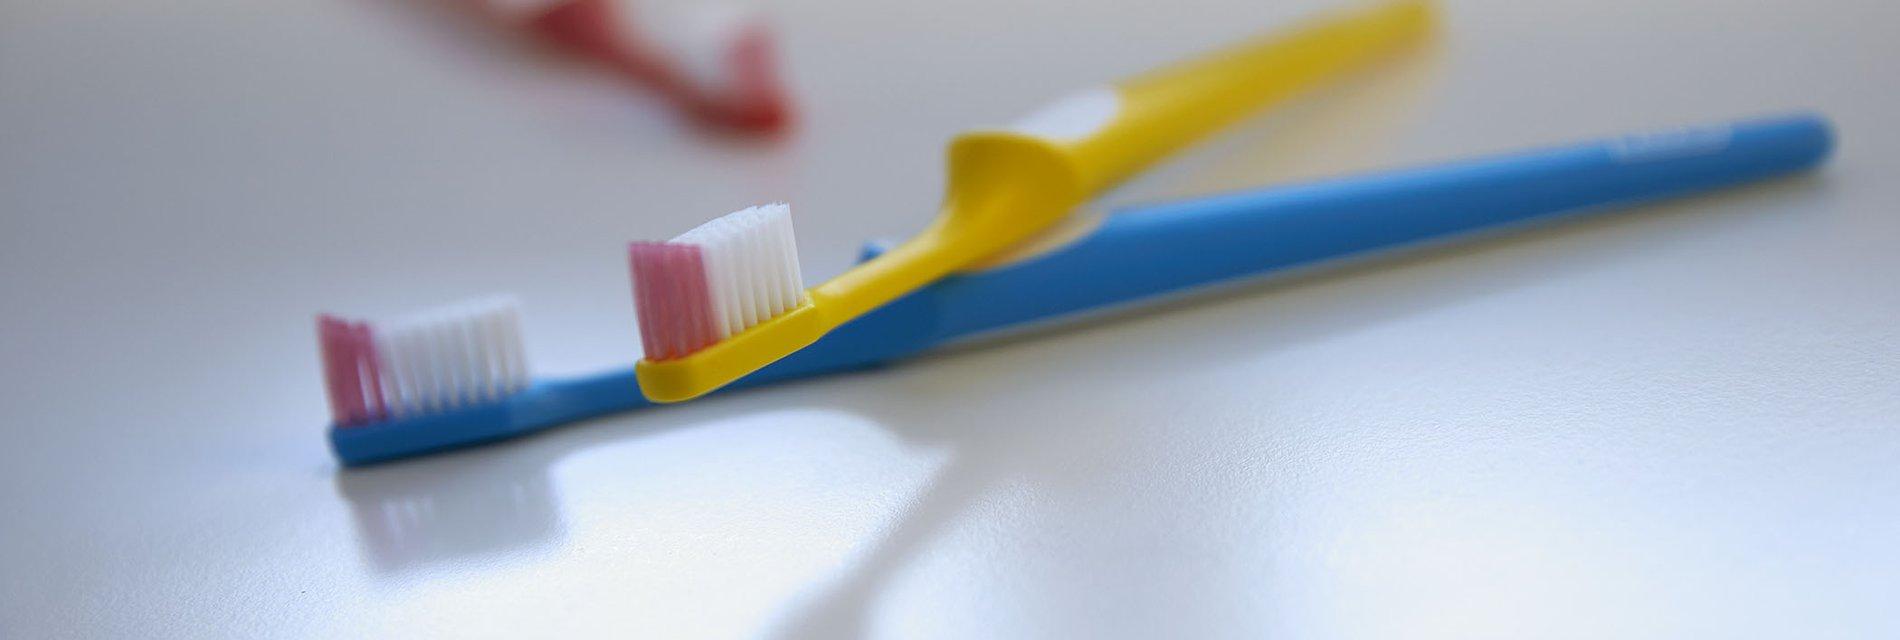 tandborstar.jpg